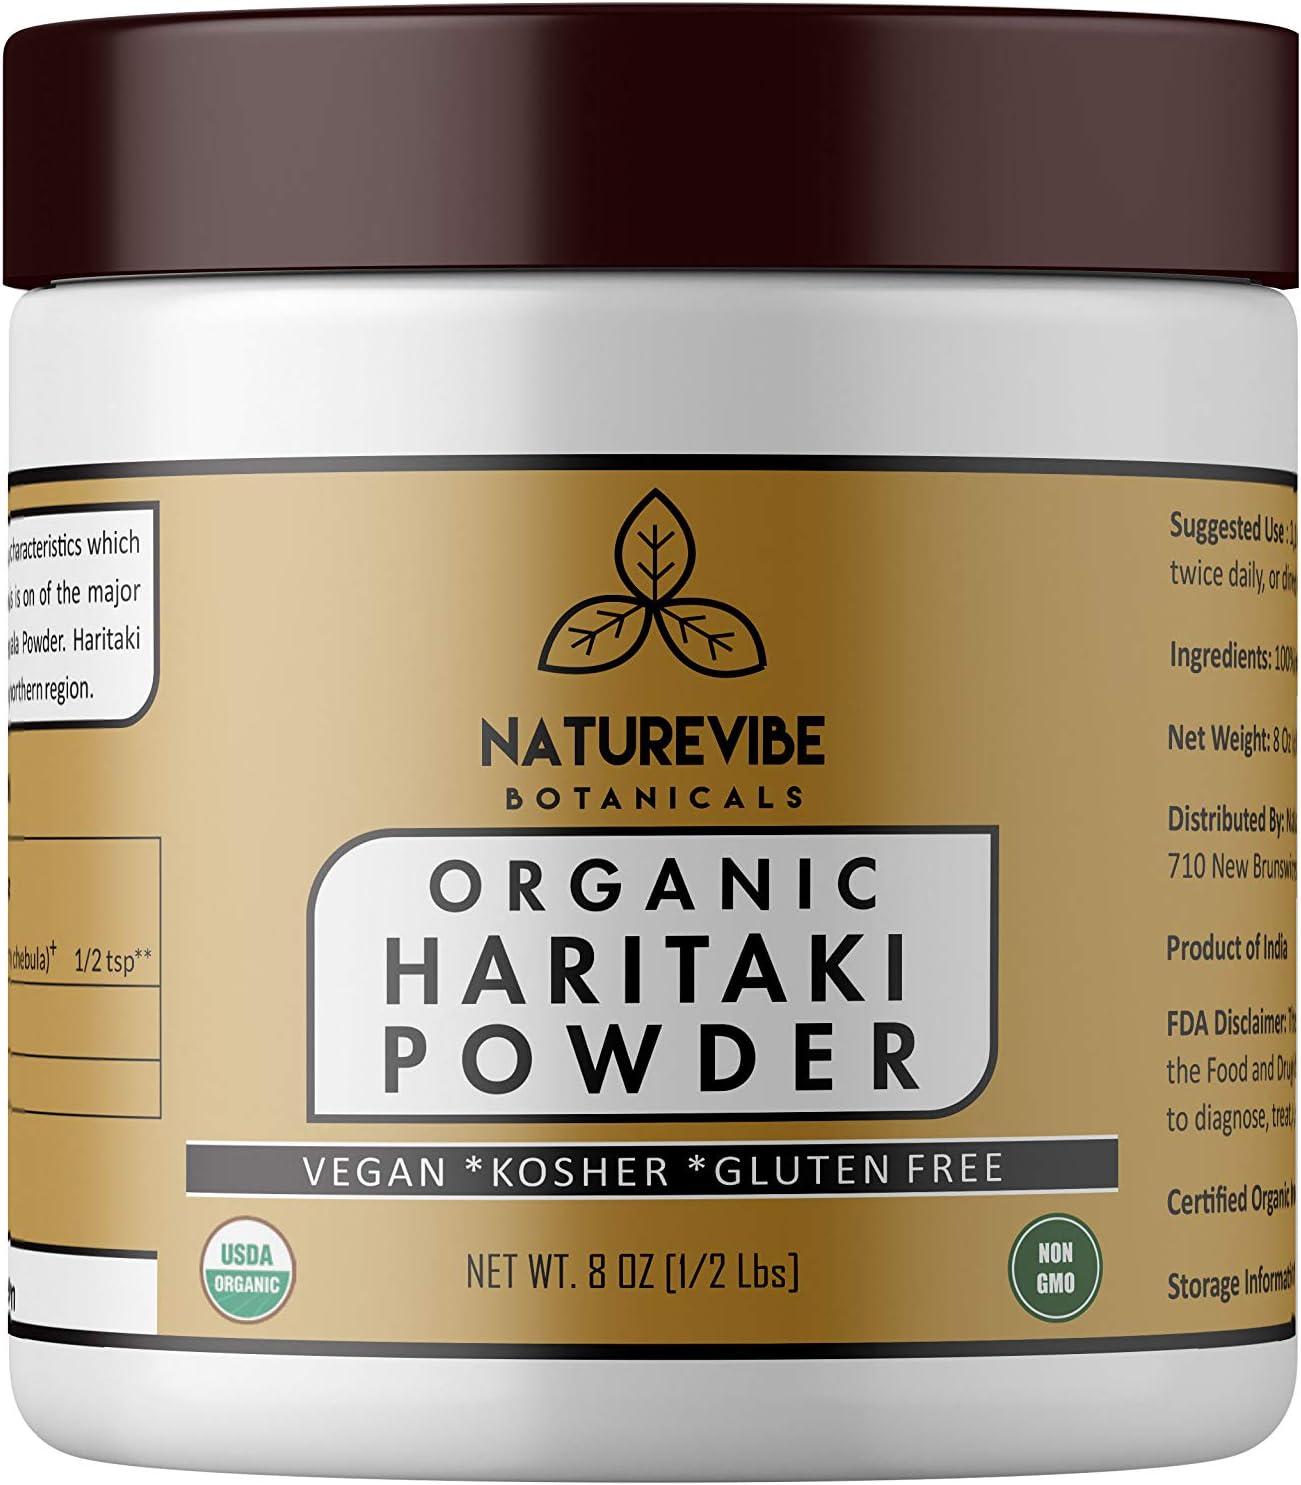 Naturevibe Botanicals Haritaki Powder (8 Oz)- USDA Organic Terminalia Chebula, Gluten Free & Non- GMO | Ayurvedic Herbal Powder